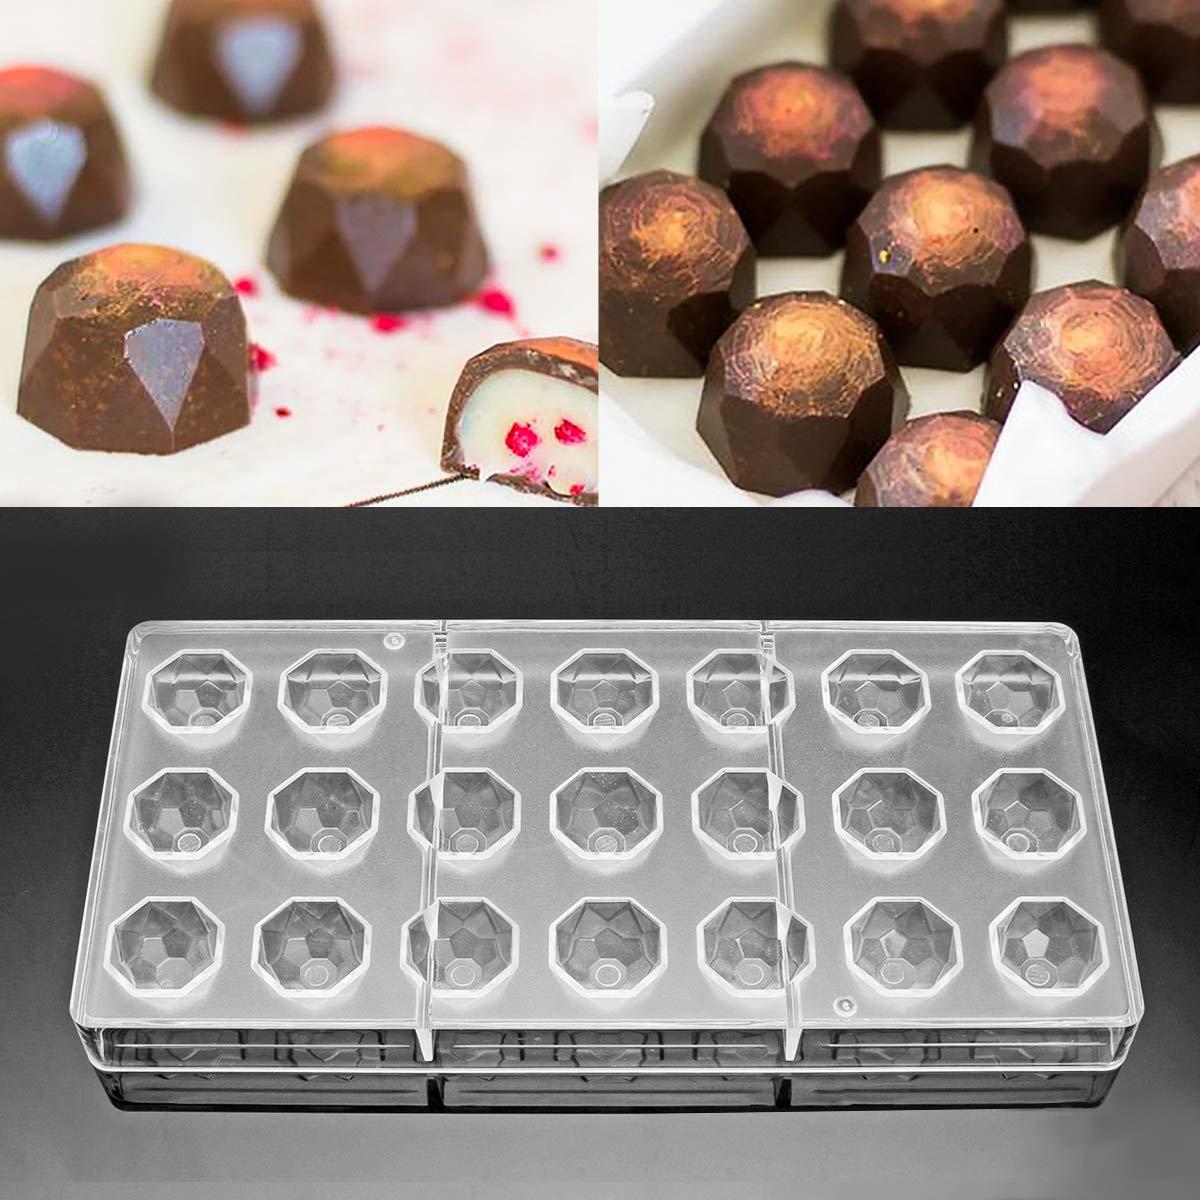 Jeteven Molde de Chocolate Molde de Caramelos para DIY Jalea Dulce Bandeja Herramienta Tridimensional (21pcs Diamente): Amazon.es: Hogar